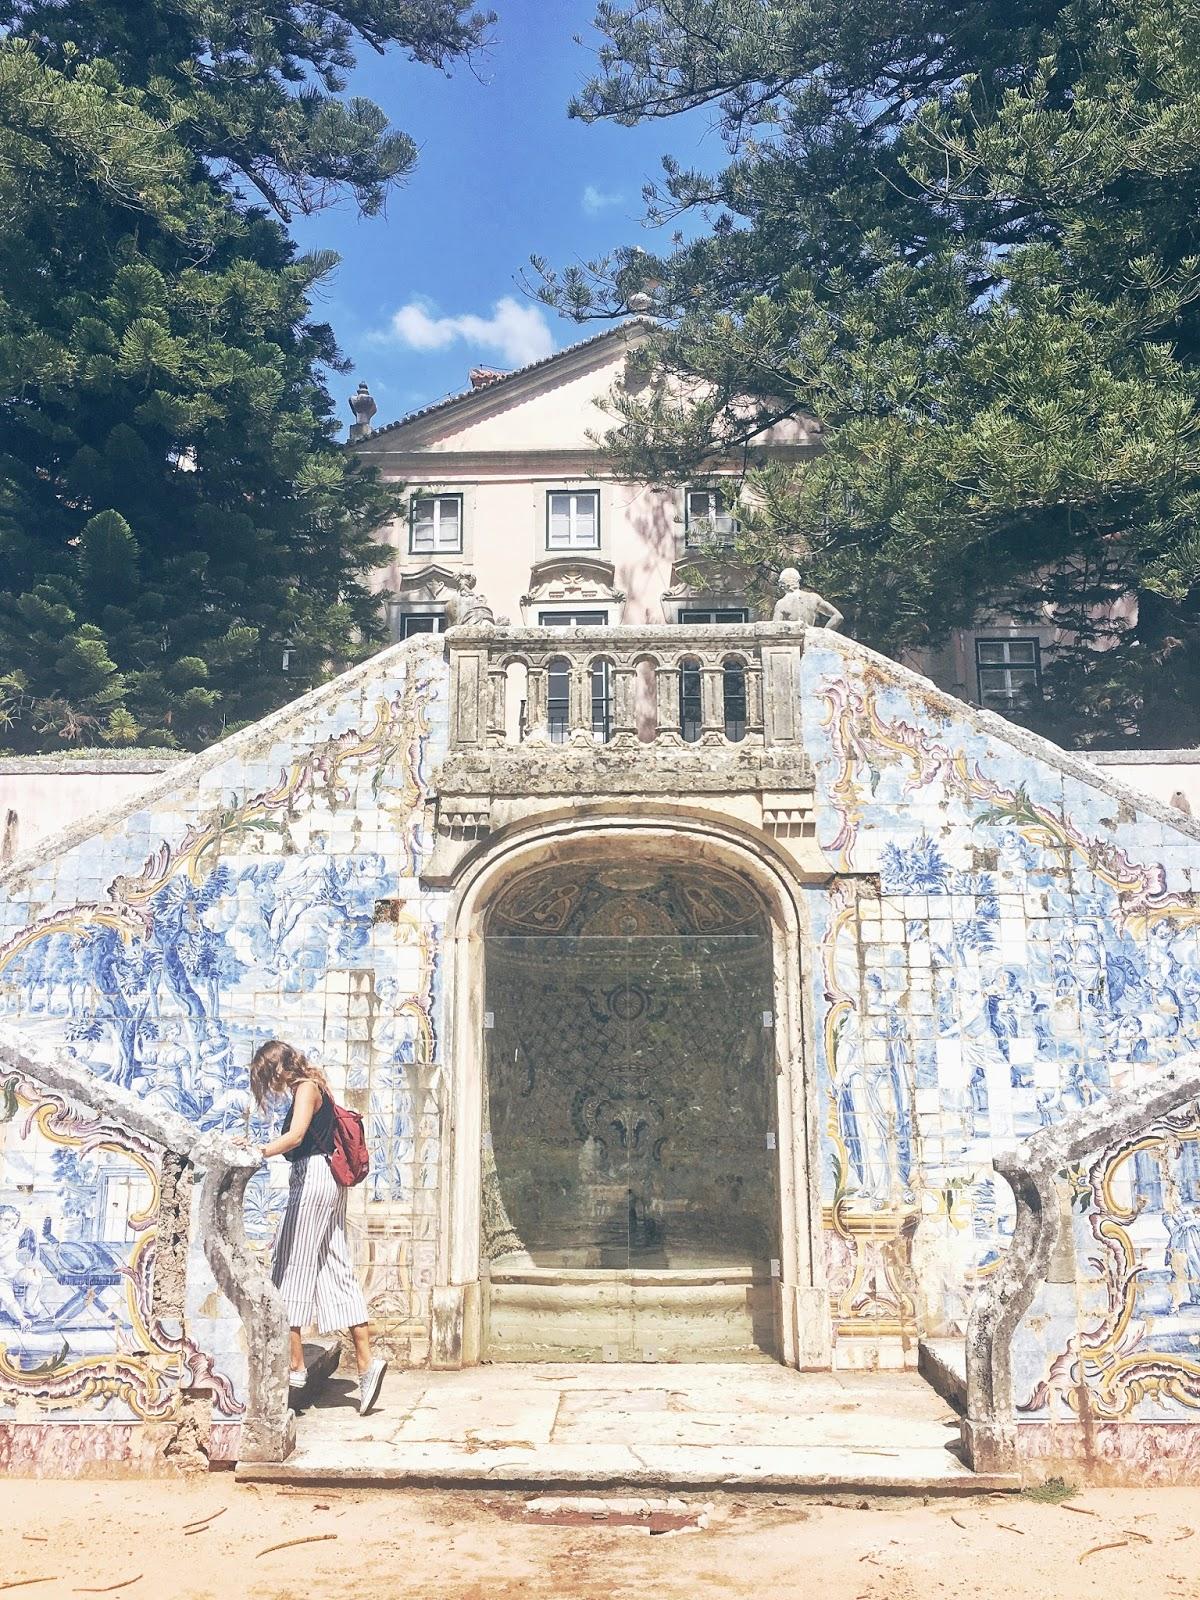 Lisabon, Lisbon, Portugal, ejnets